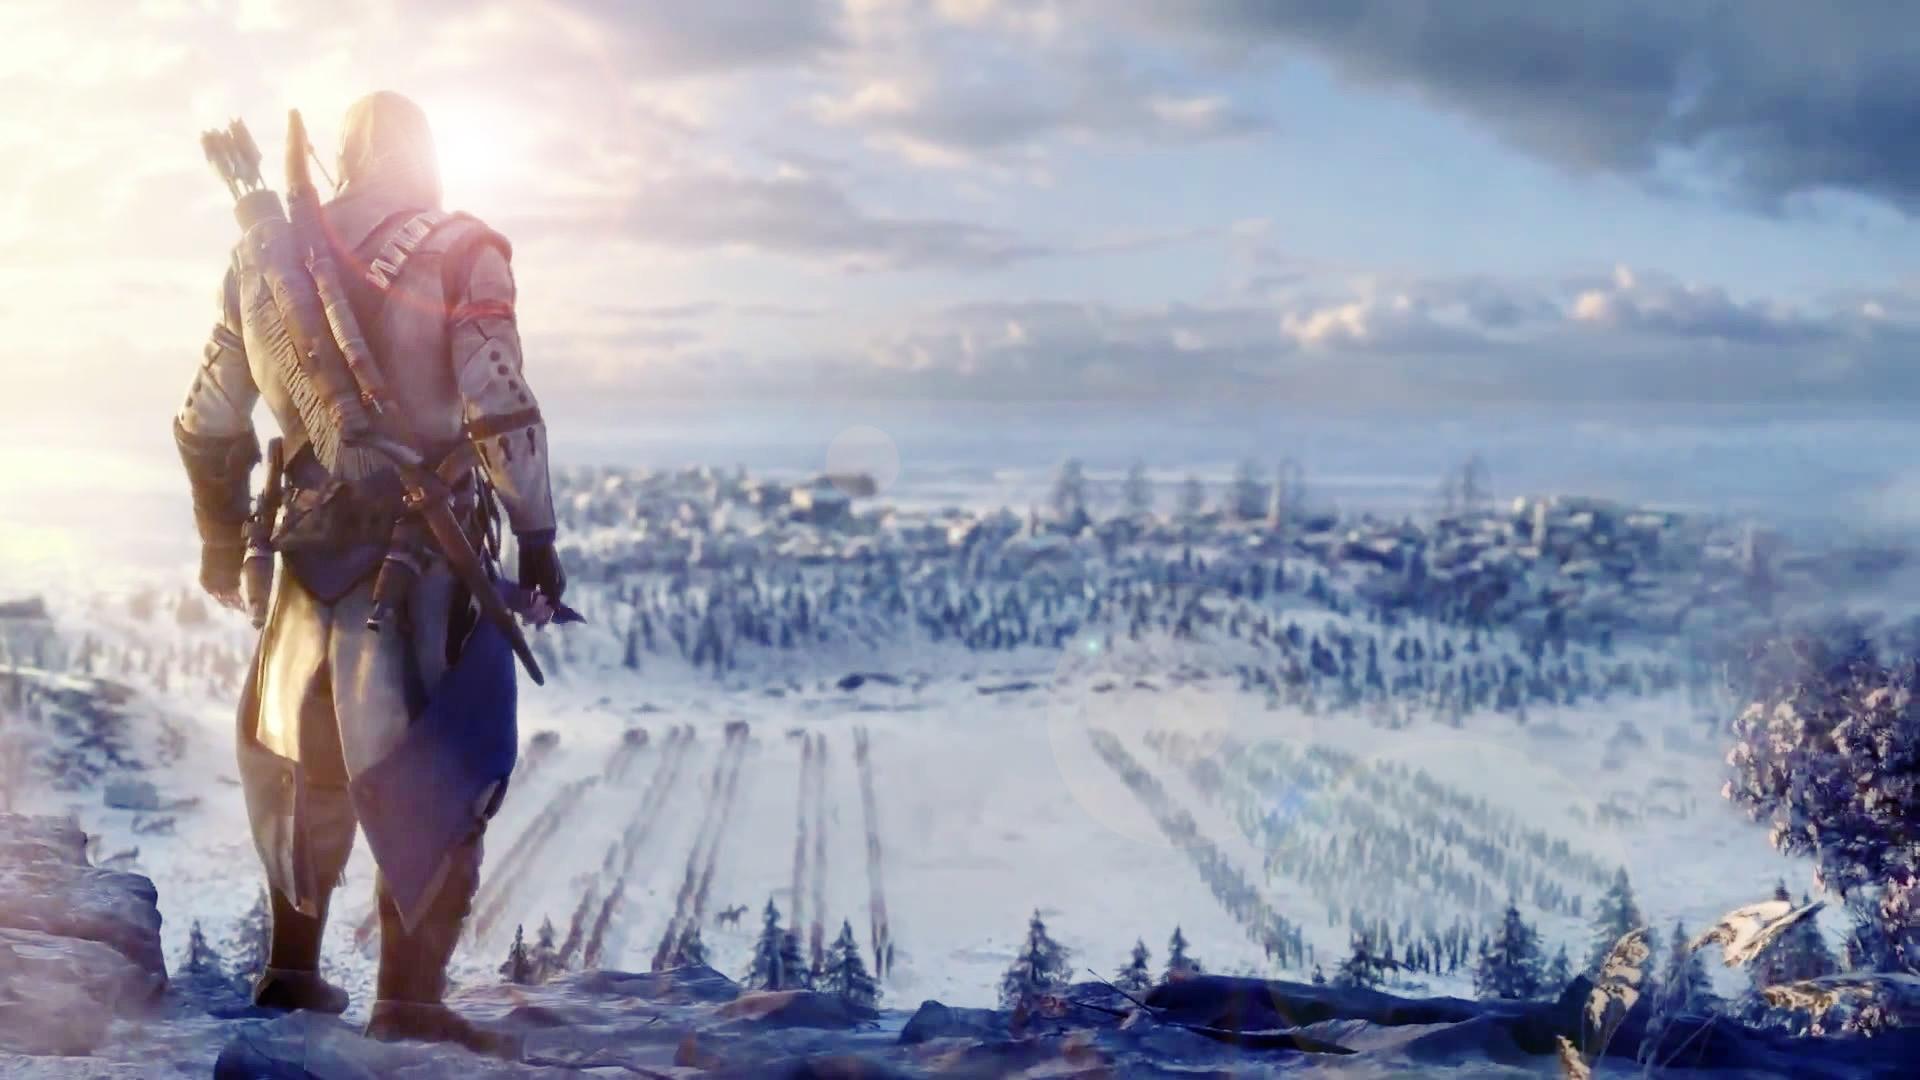 Assassins Creed Wallpaper 1080p: Full HD Desktop Wallpapers 1080p